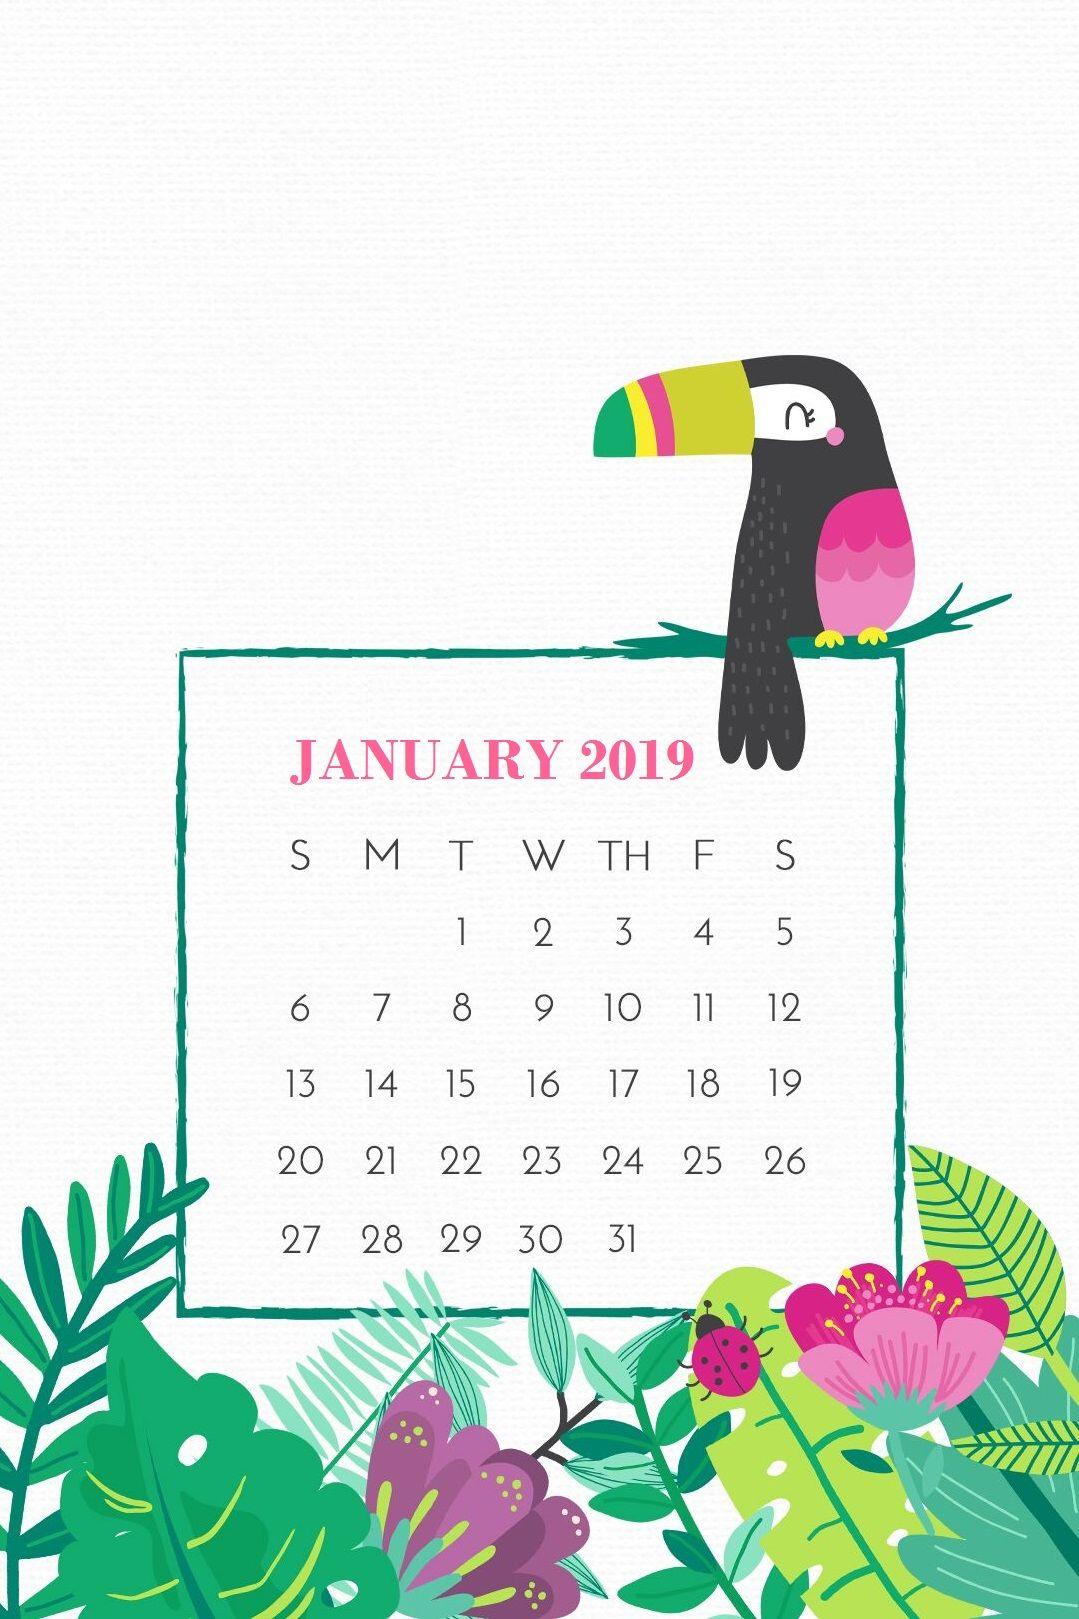 January 2019 Smartphone Calendar Screensaver Background